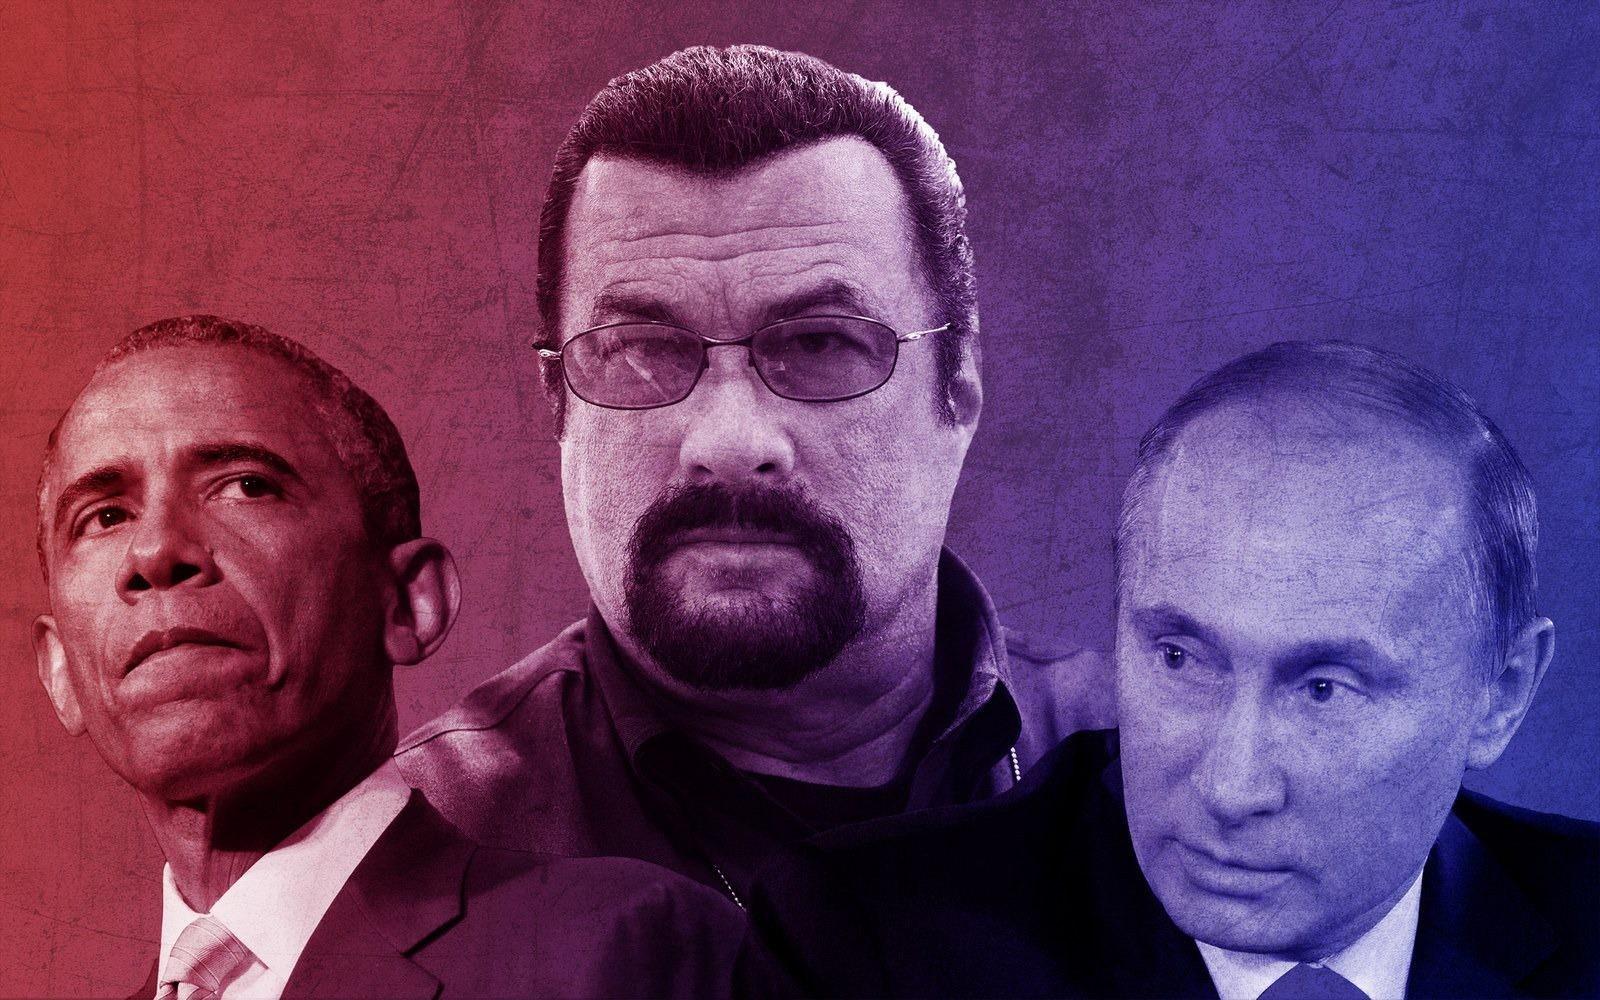 Putin's Action Hero: How Steven Seagal Became the Kremlin's Unlikeliest Envoy